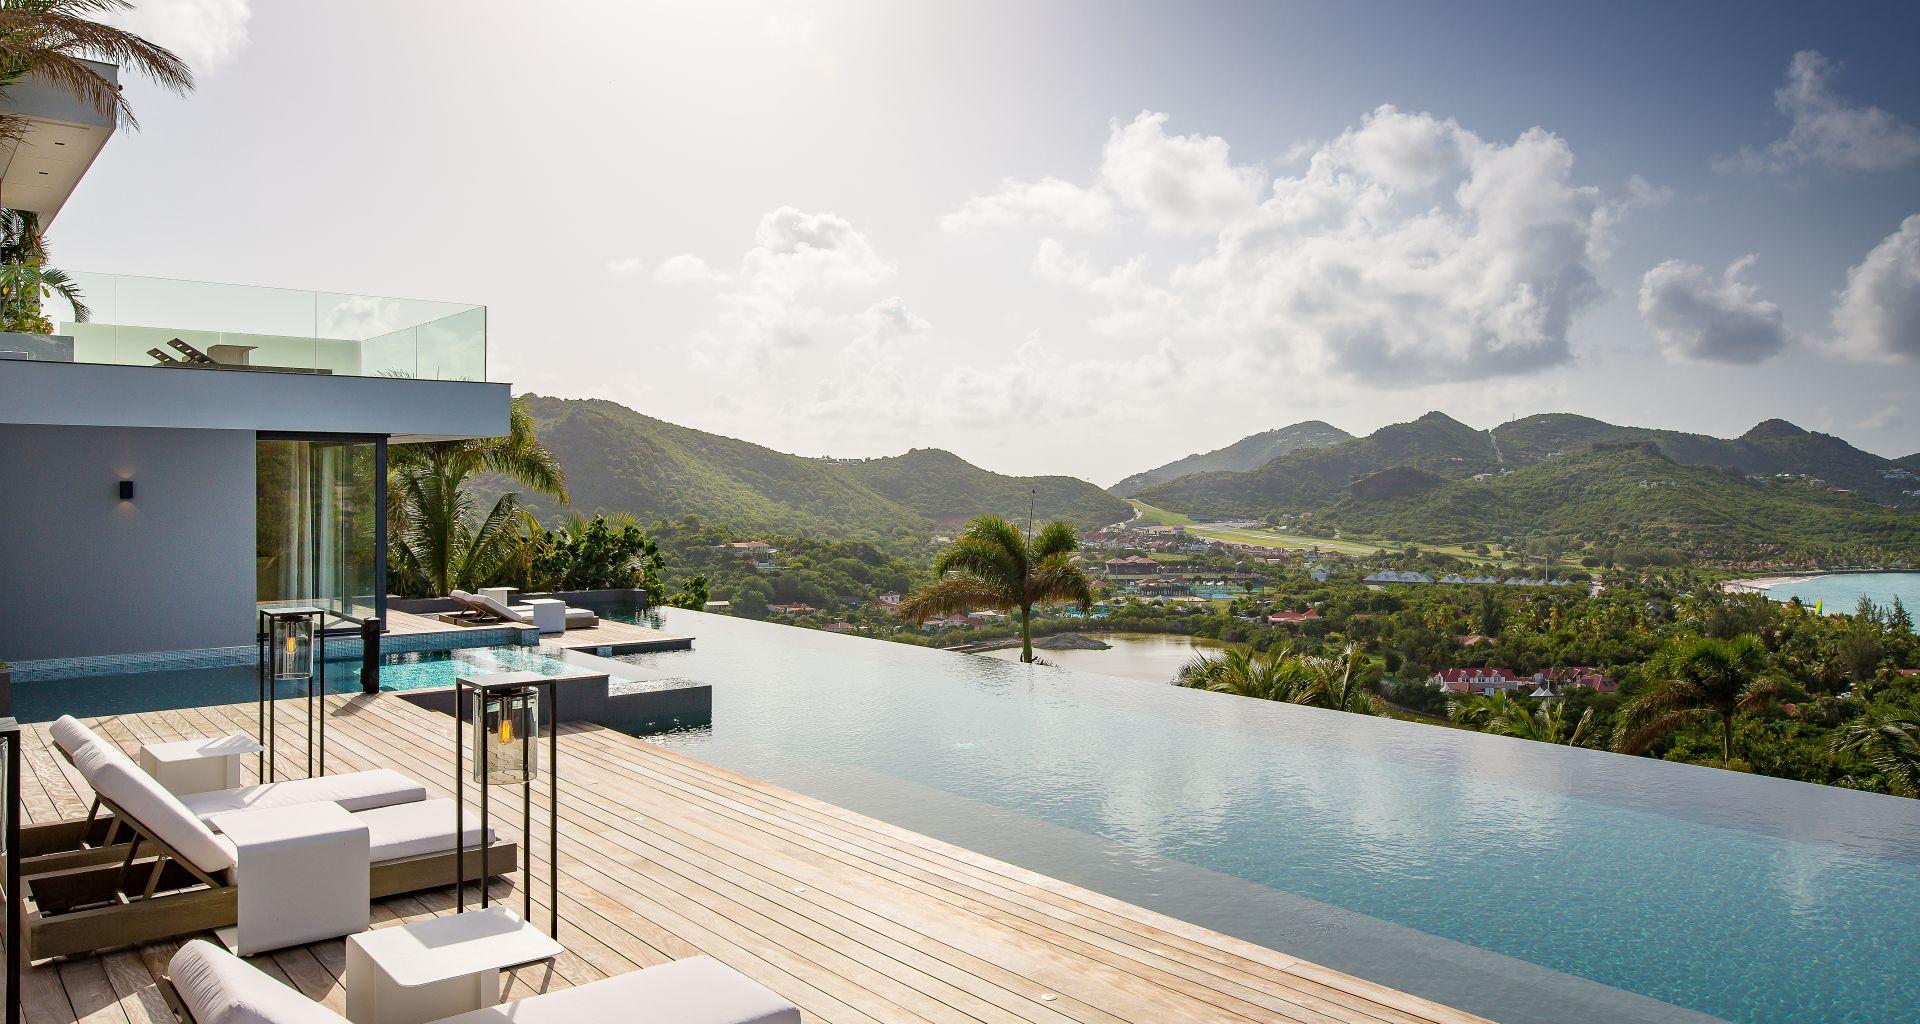 Villa Neo, St-Barts, Caribbean